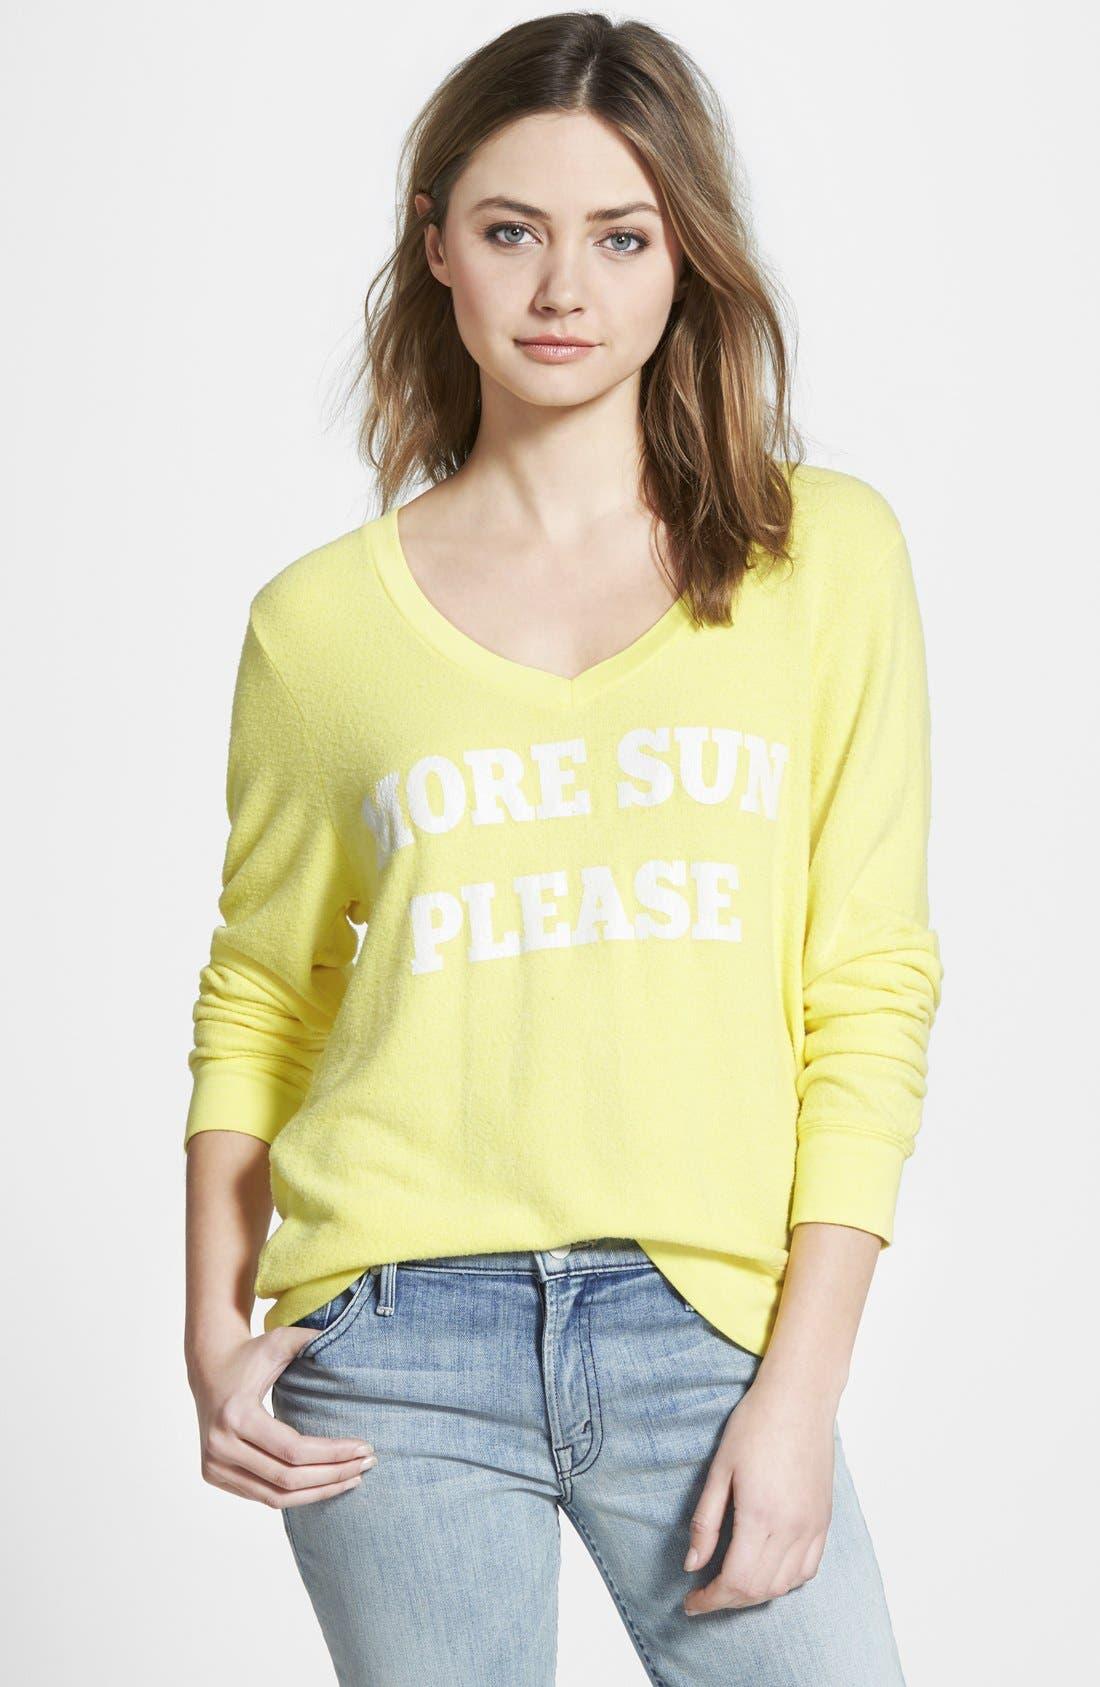 Alternate Image 1 Selected - Wildfox 'More Sun' V-Neck Sweatshirt